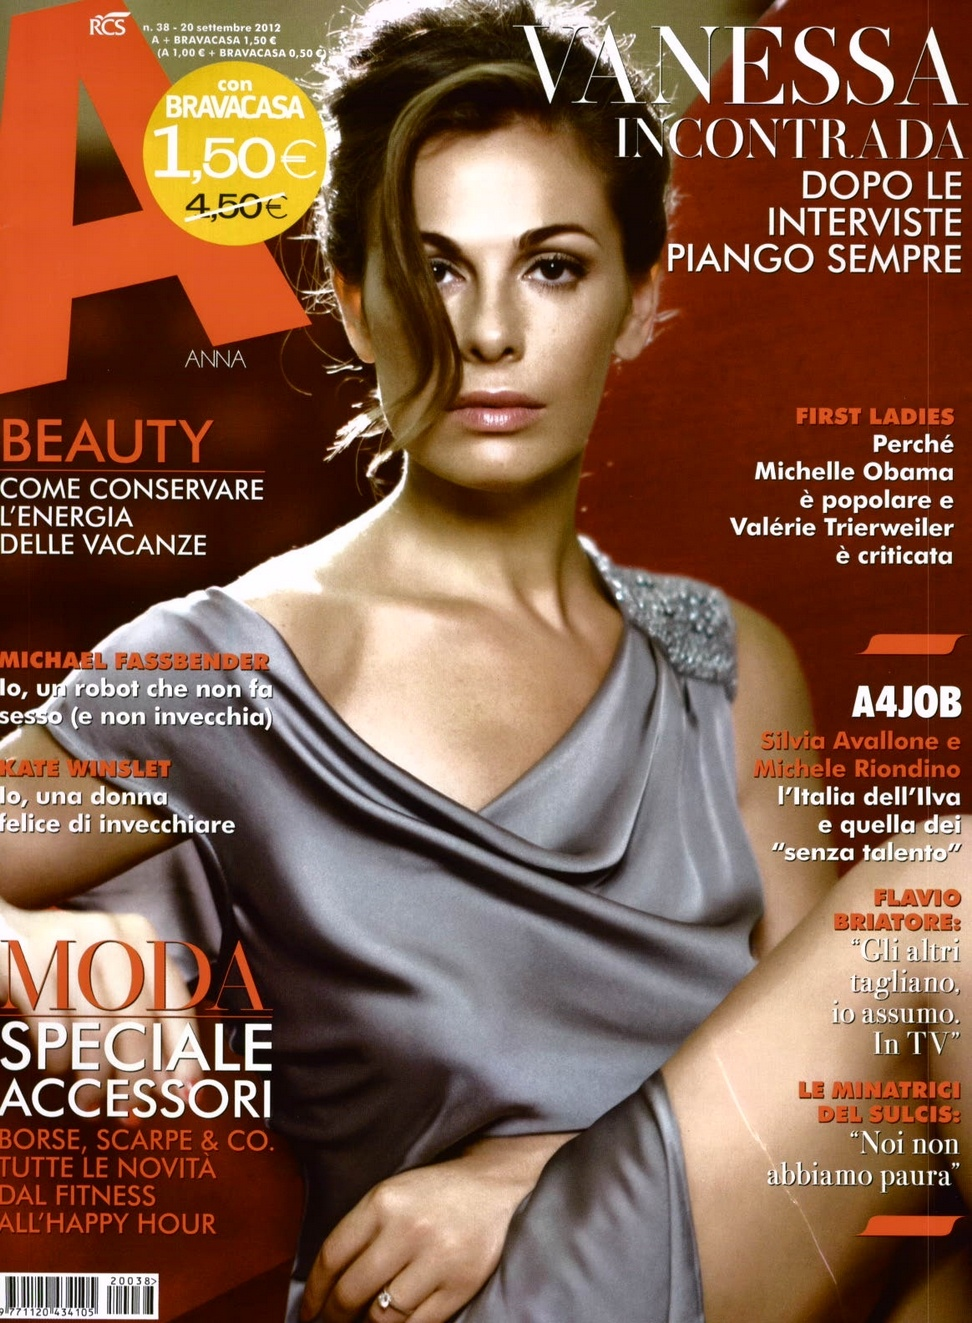 TCA Showroom: TCA Brands In Fashion Magazines--Part 2